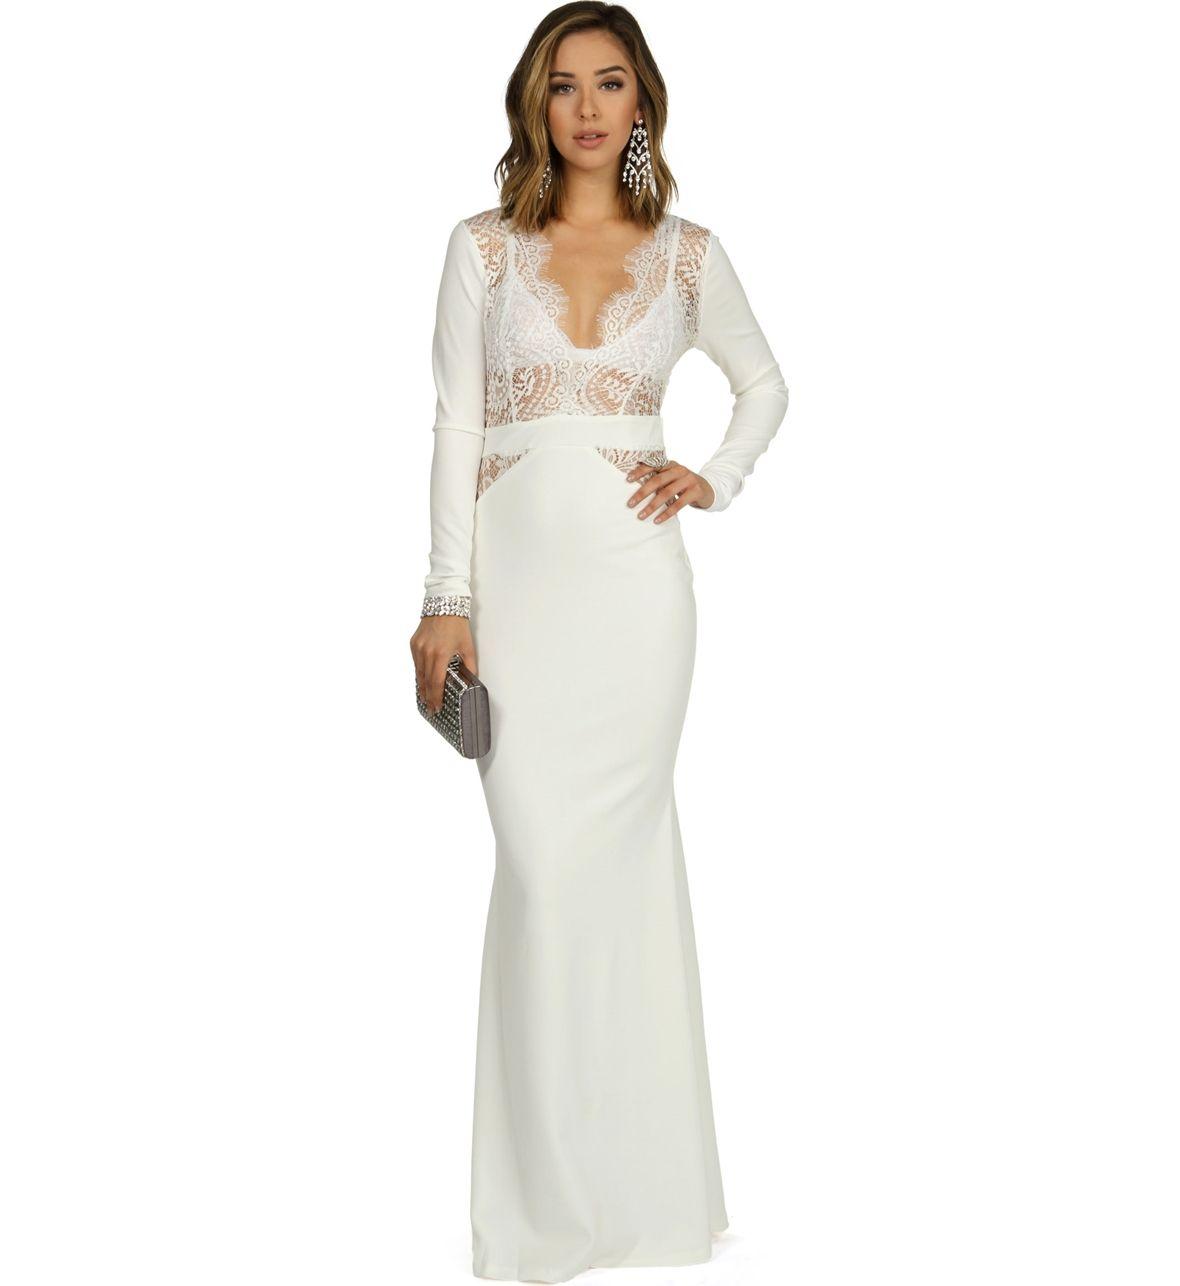 Modern Prom Dress Shops In Windsor Vignette - Wedding Dress Ideas ...